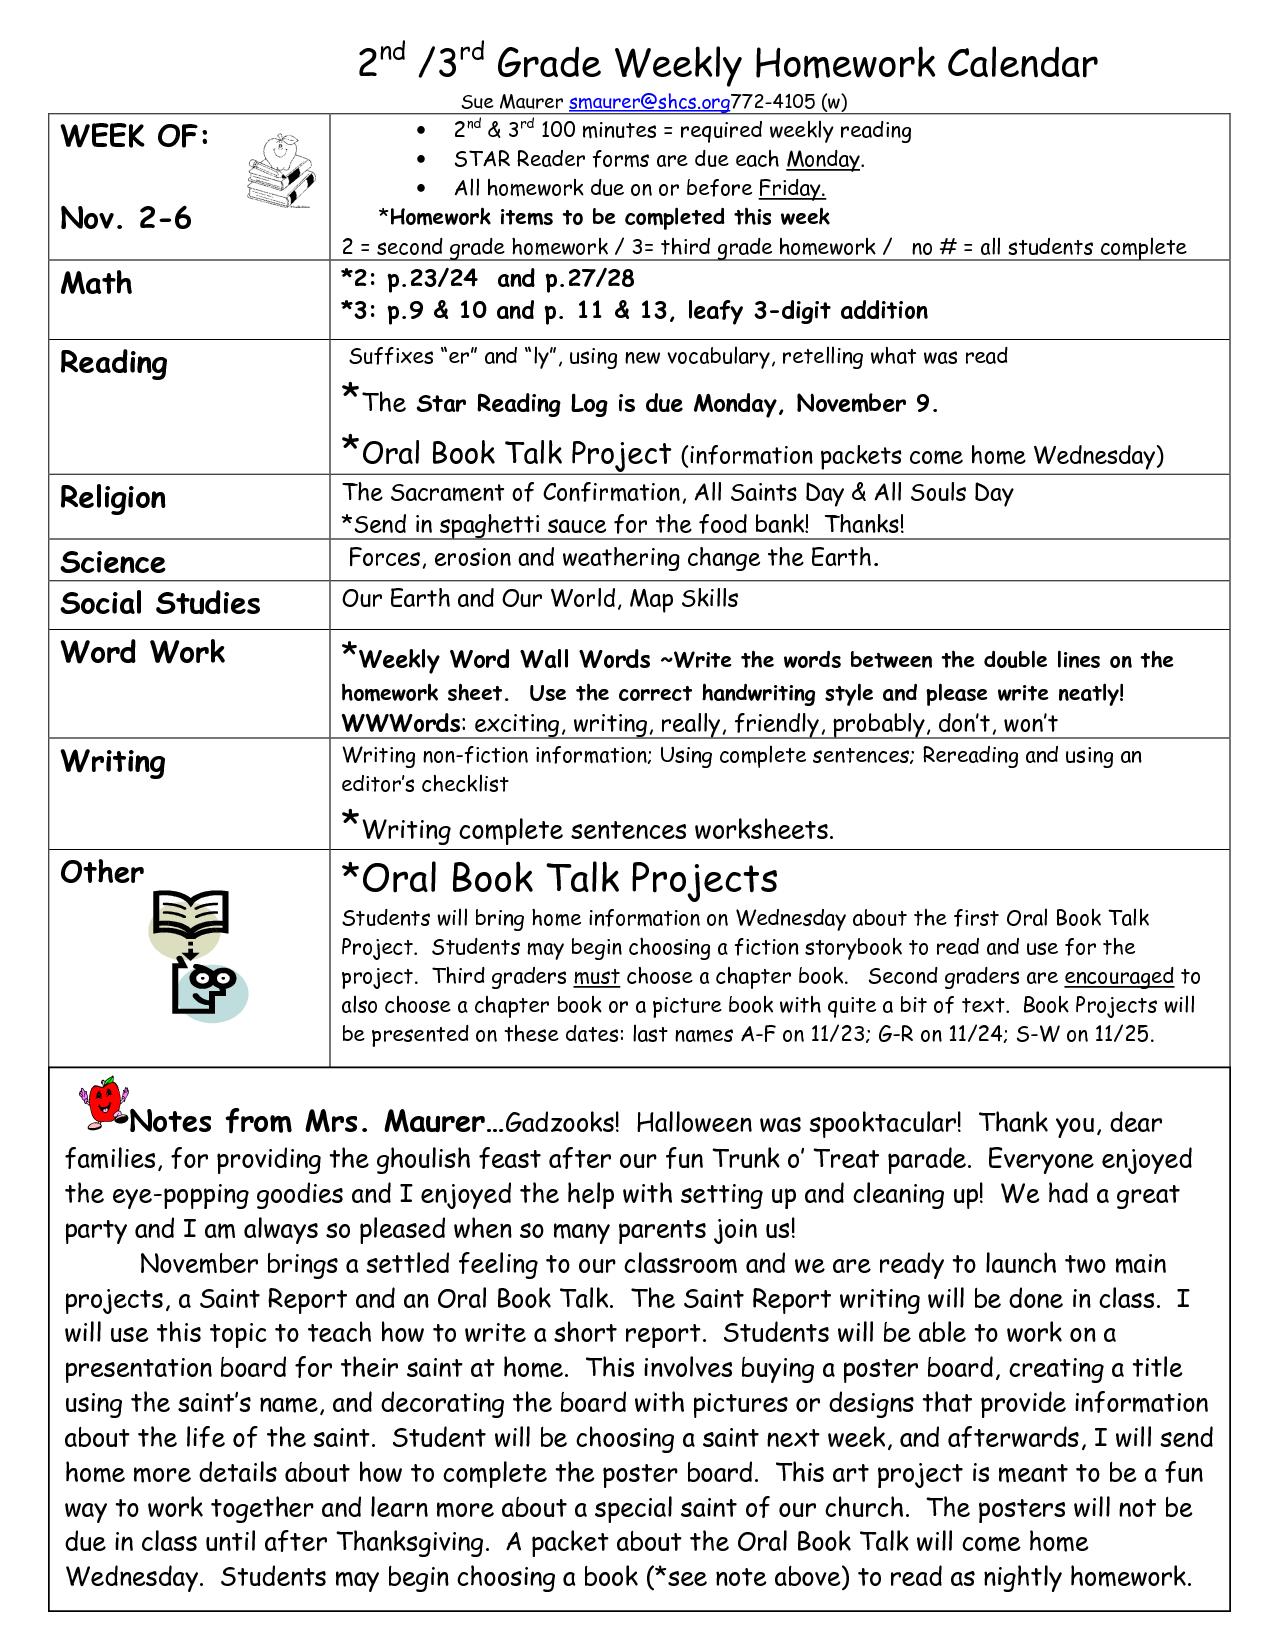 reading homework template | Grade Weekly Homework Calendar The Star ...